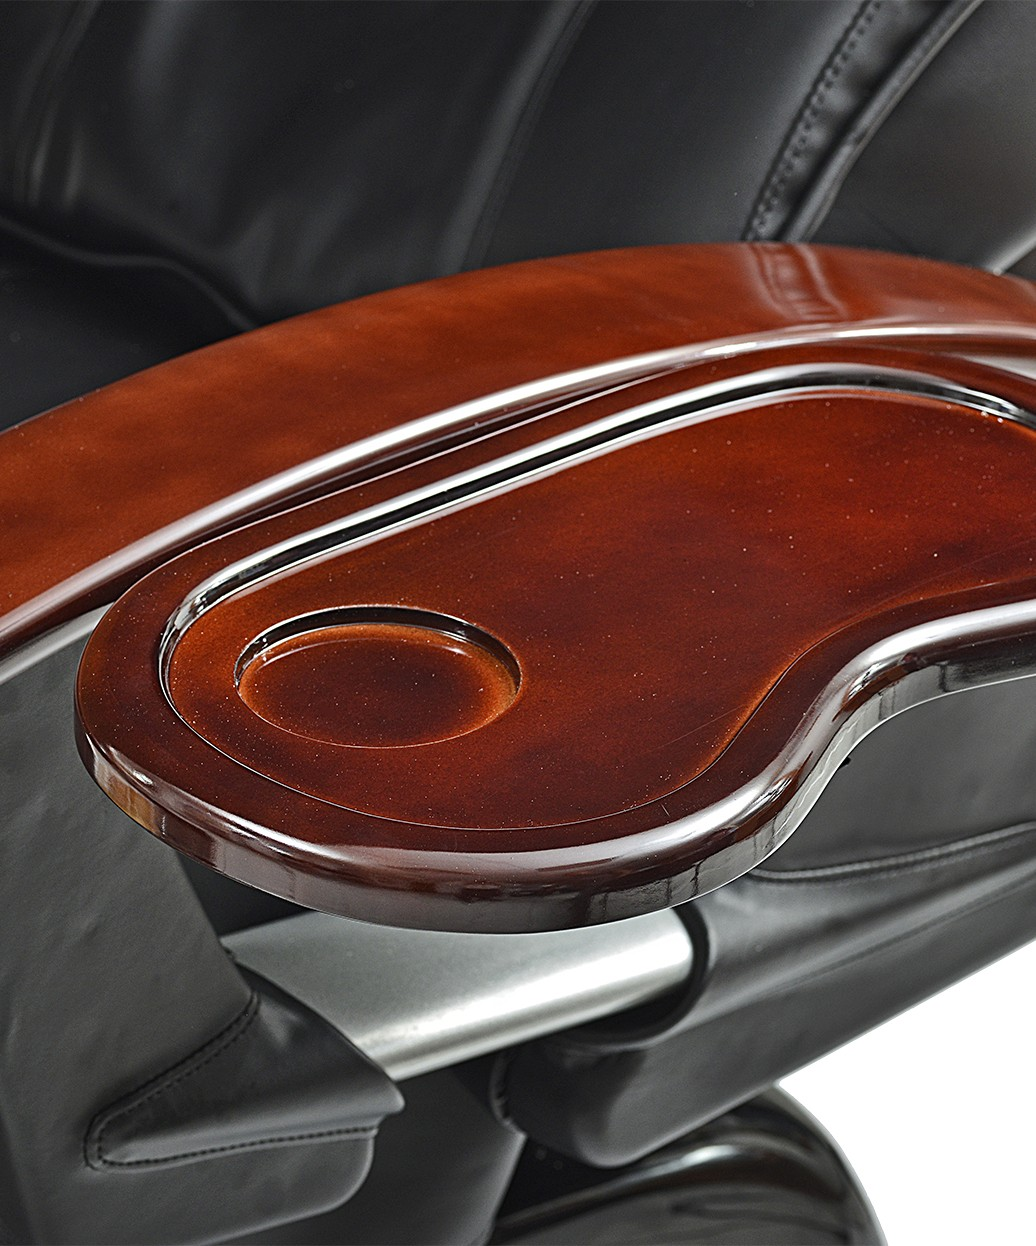 Pibbs PS65 San Marino Pipeless Pedicure Spa w/ Glass Bowl & Shiatsu Massage